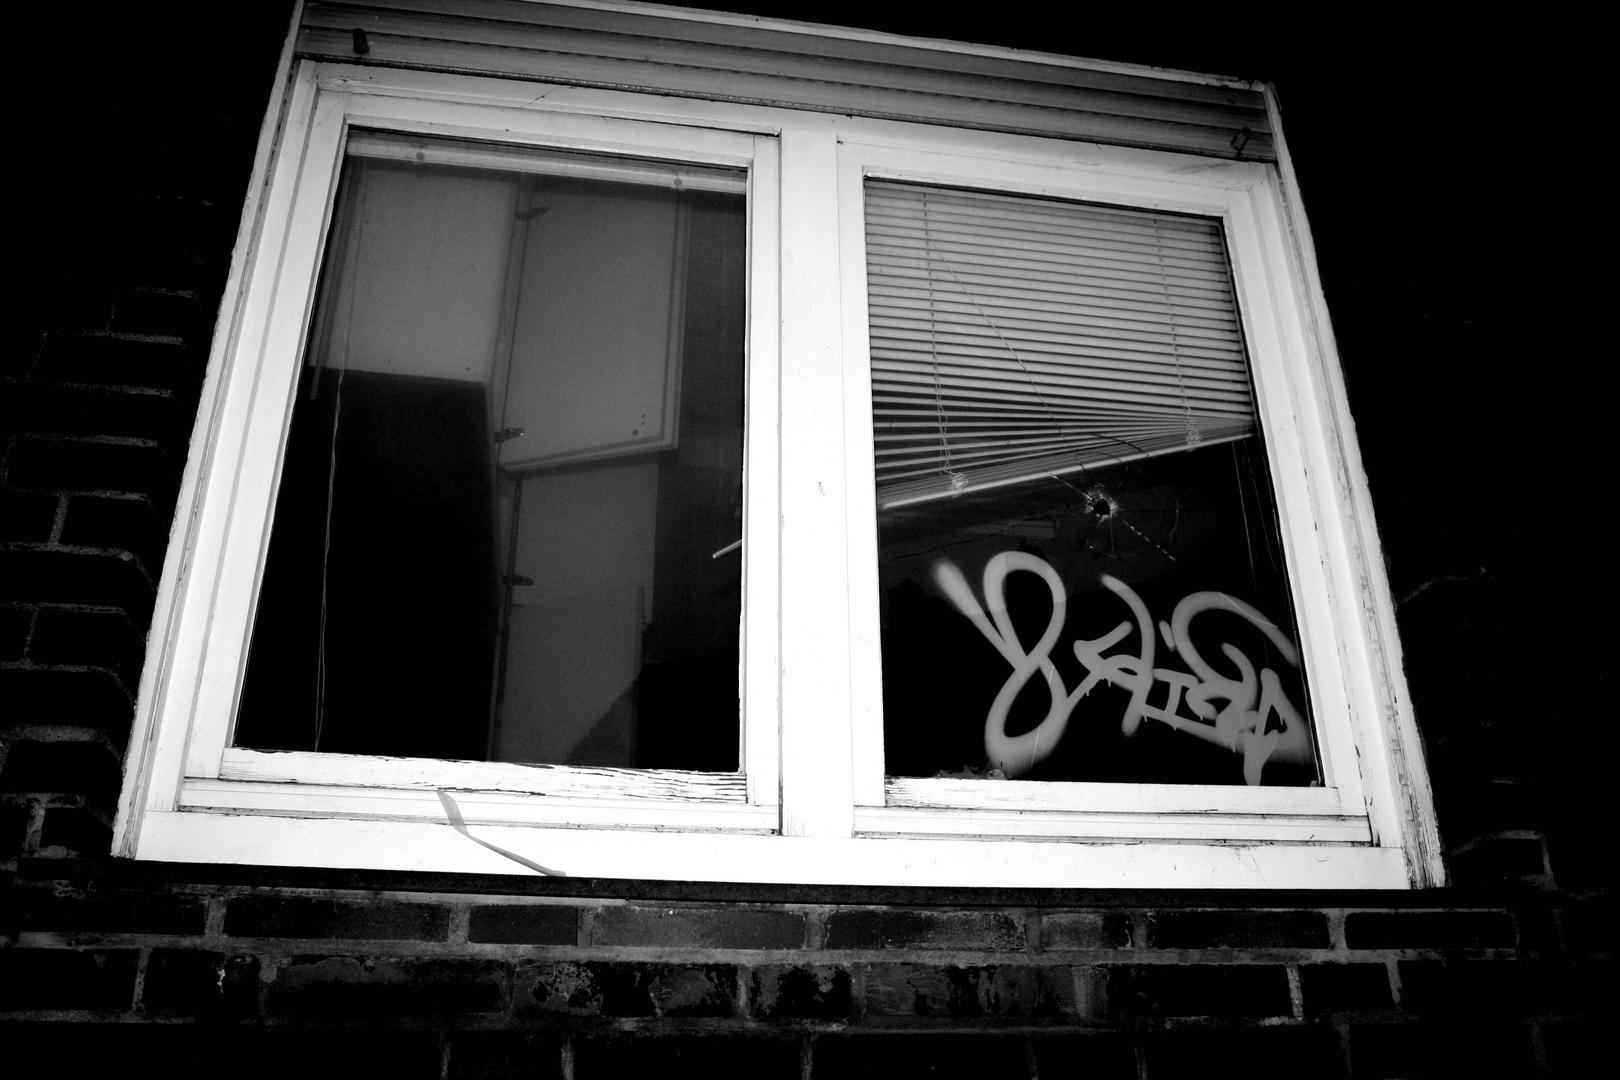 Ghettoarchitekt